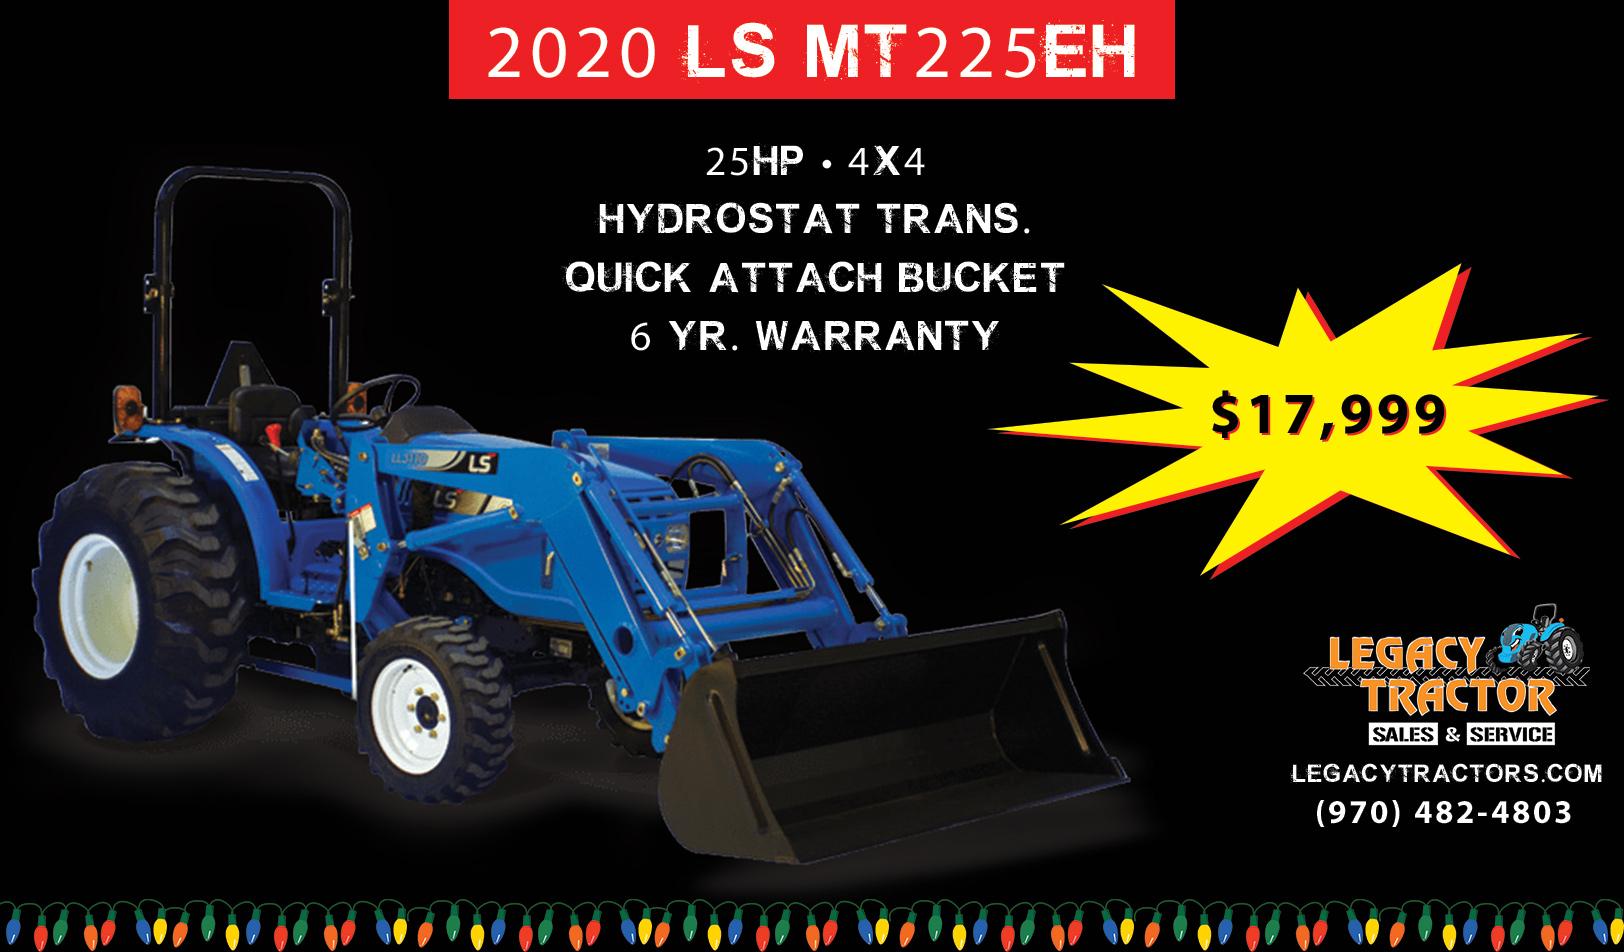 2020-LS-MT225EH-lights-on-bottom-2